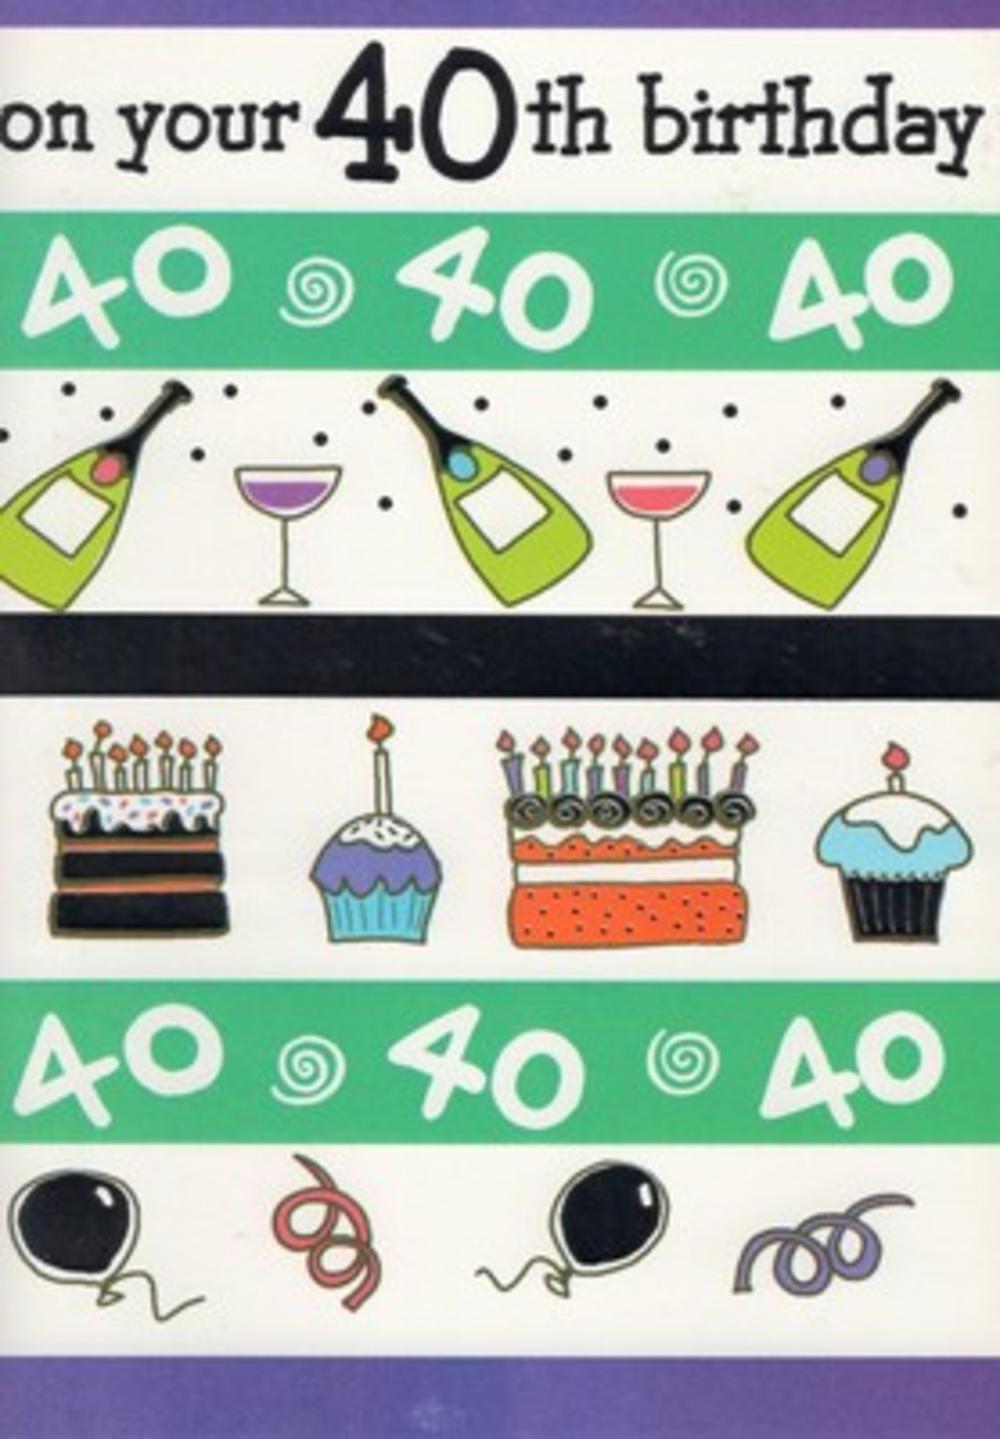 Special 40th Birthday Card